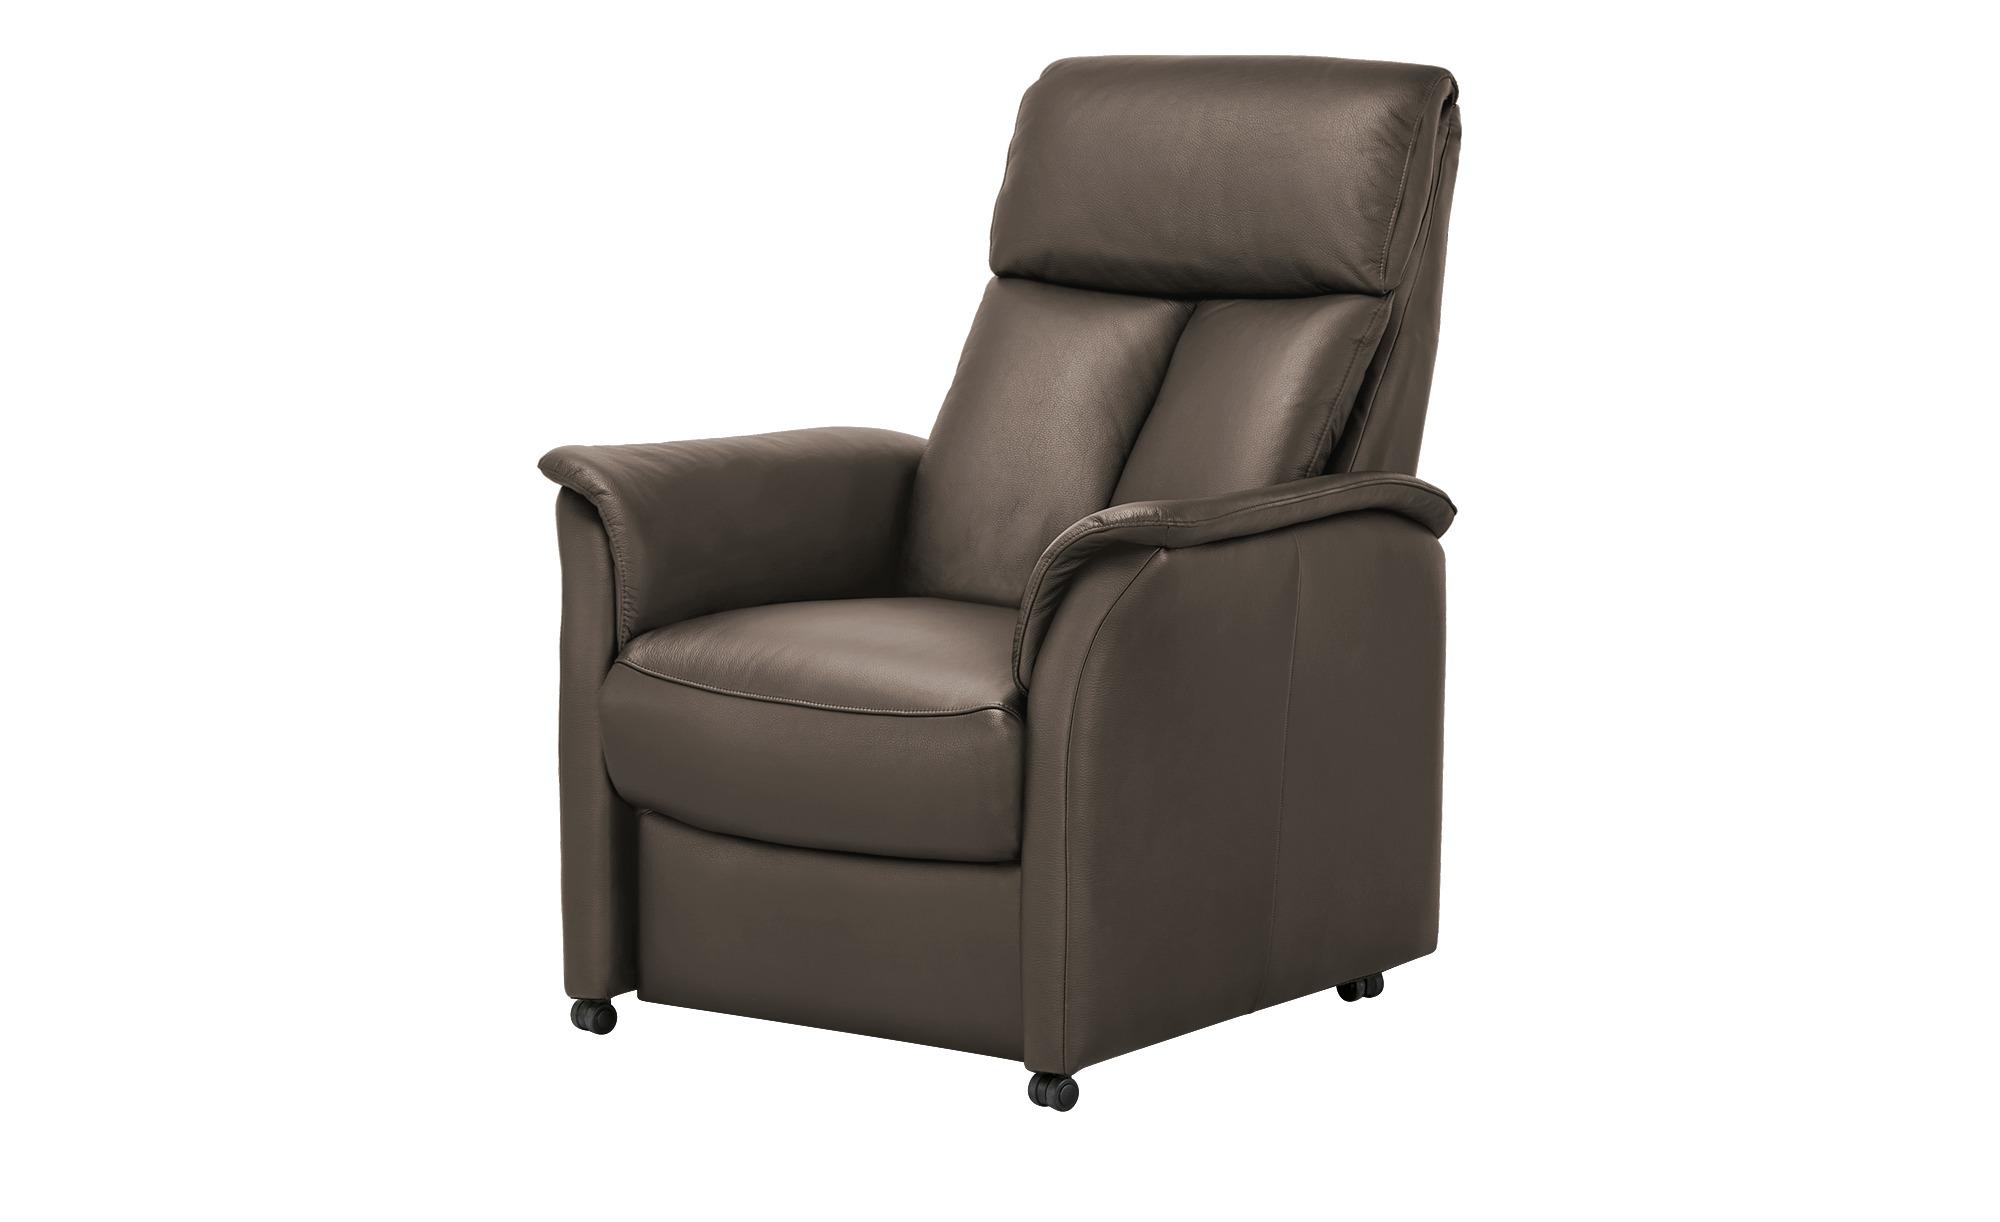 Nils Olsen Fernsehsessel M  Agda ¦ braun ¦ Maße (cm): B: 85 H: 110 T: 85 Polstermöbel > Sessel > Ledersessel - Höffner